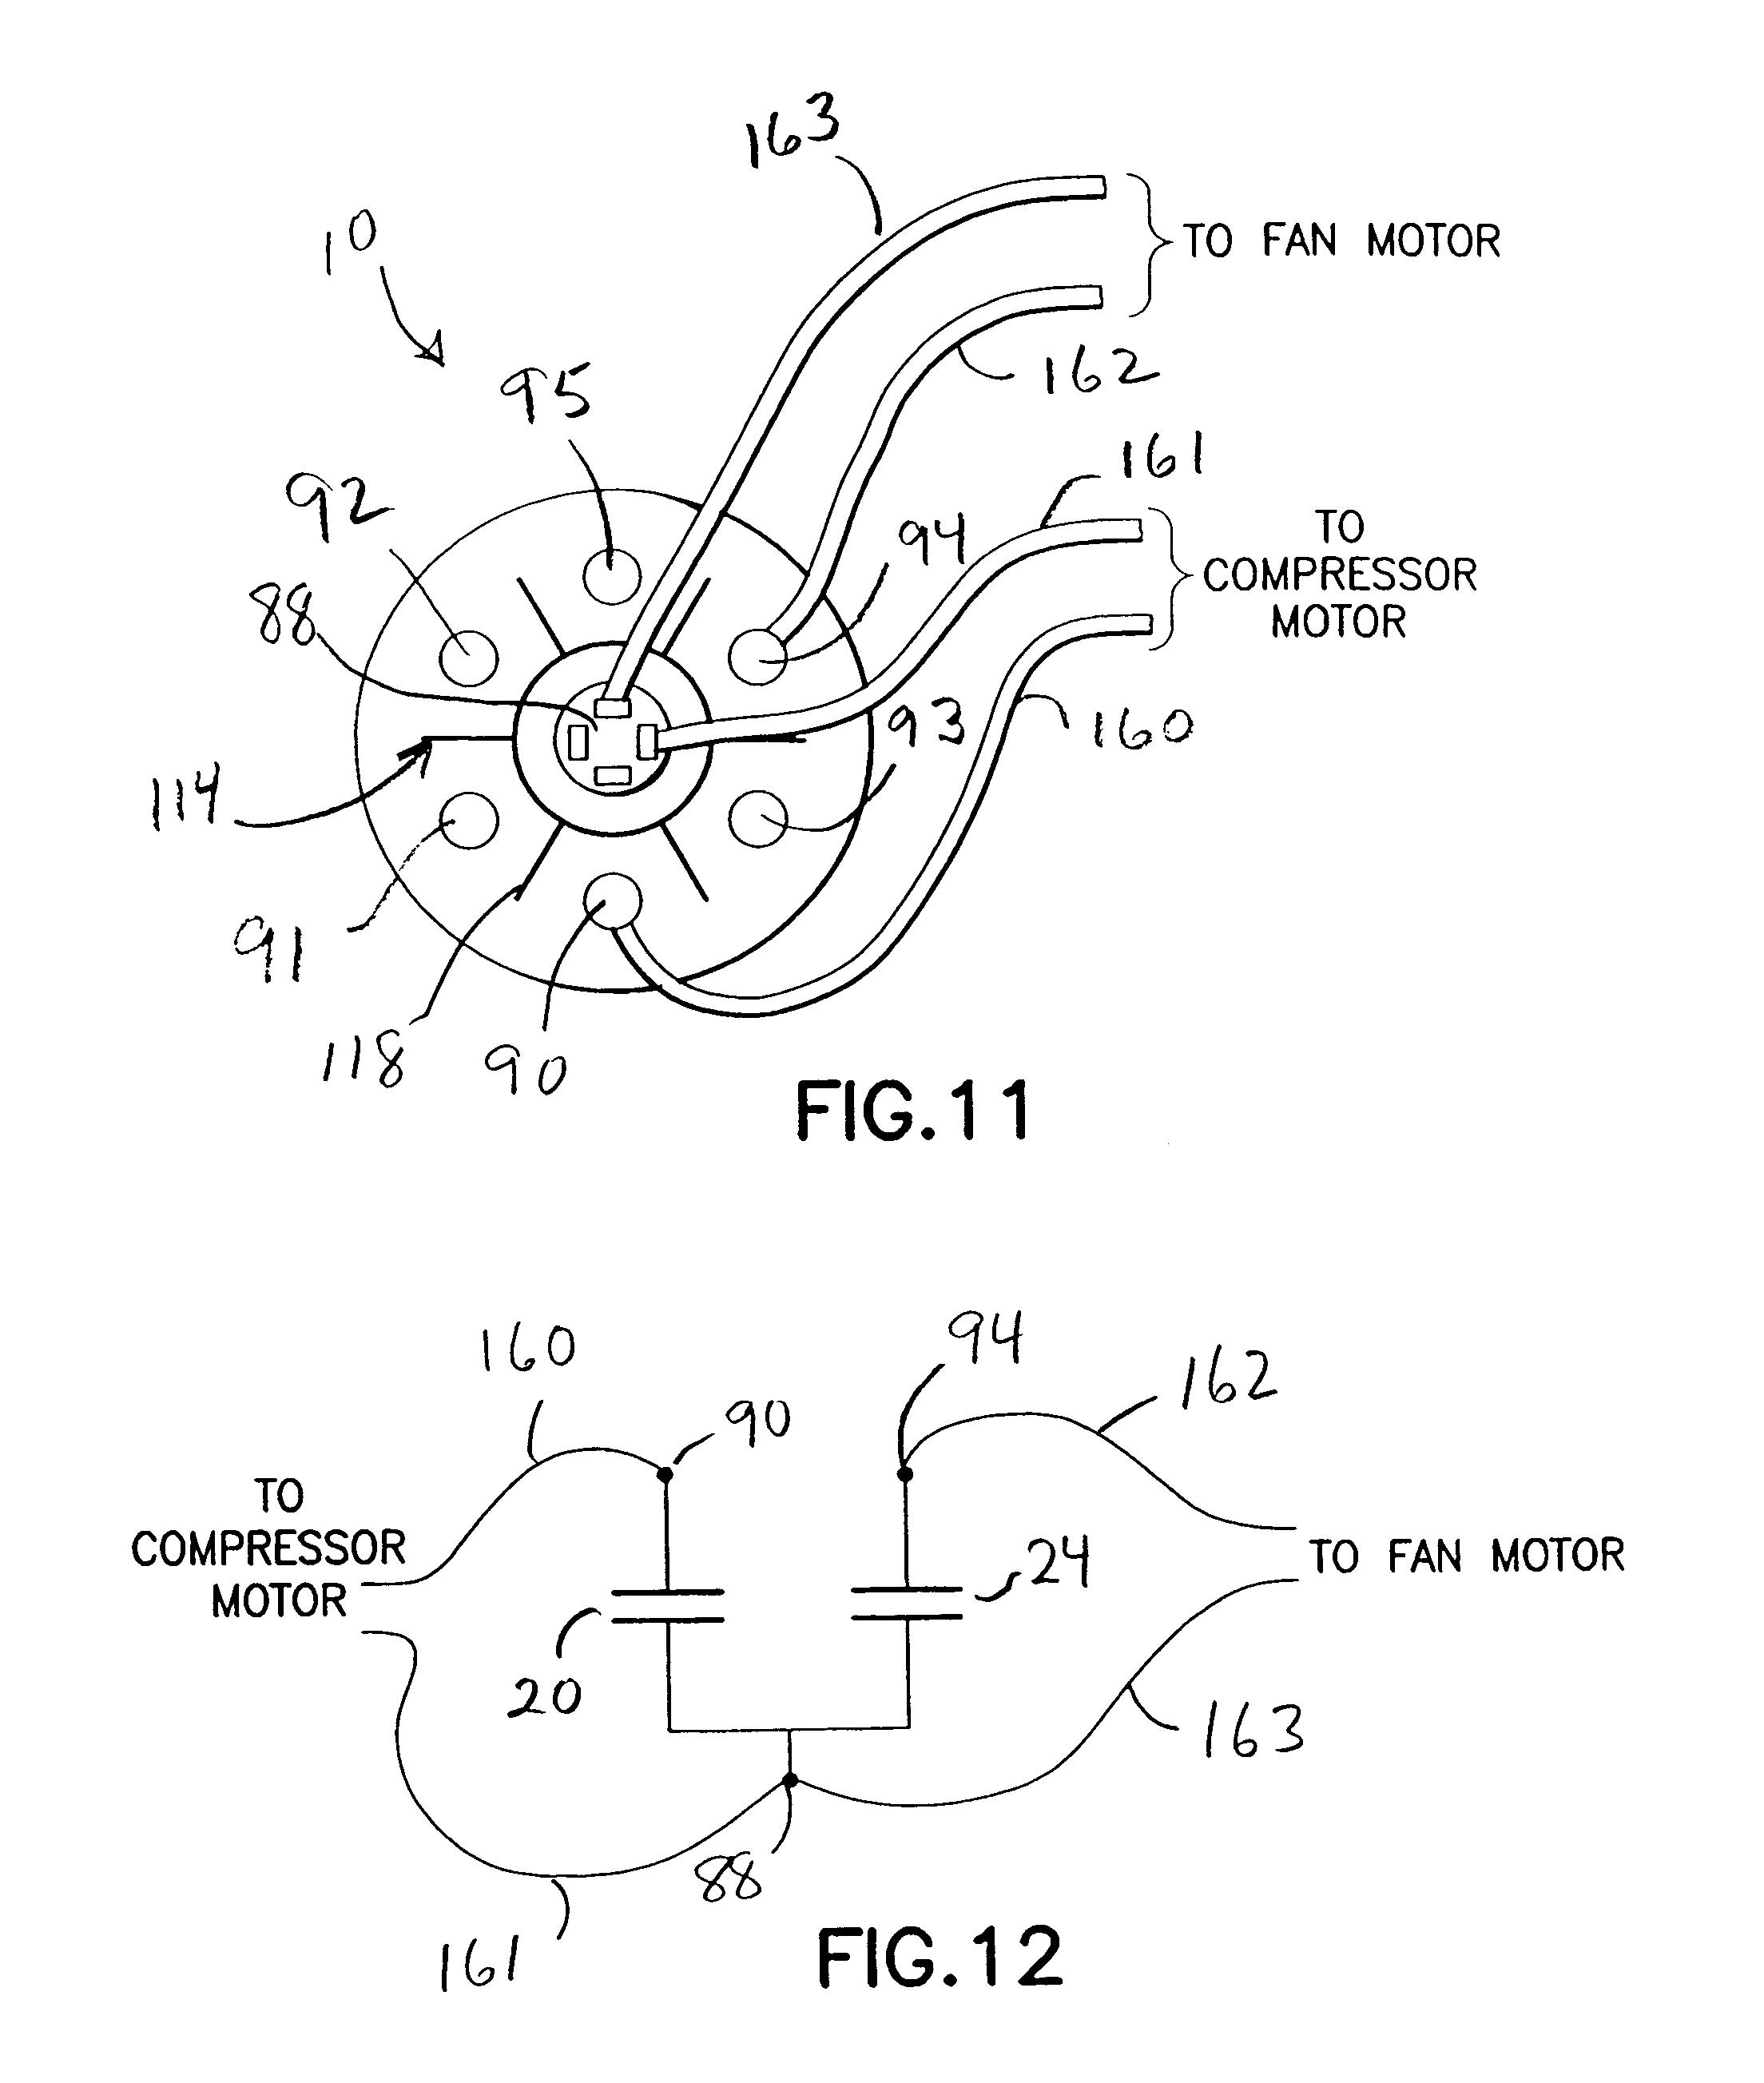 Wiring Diagram Ducane Dbp36b